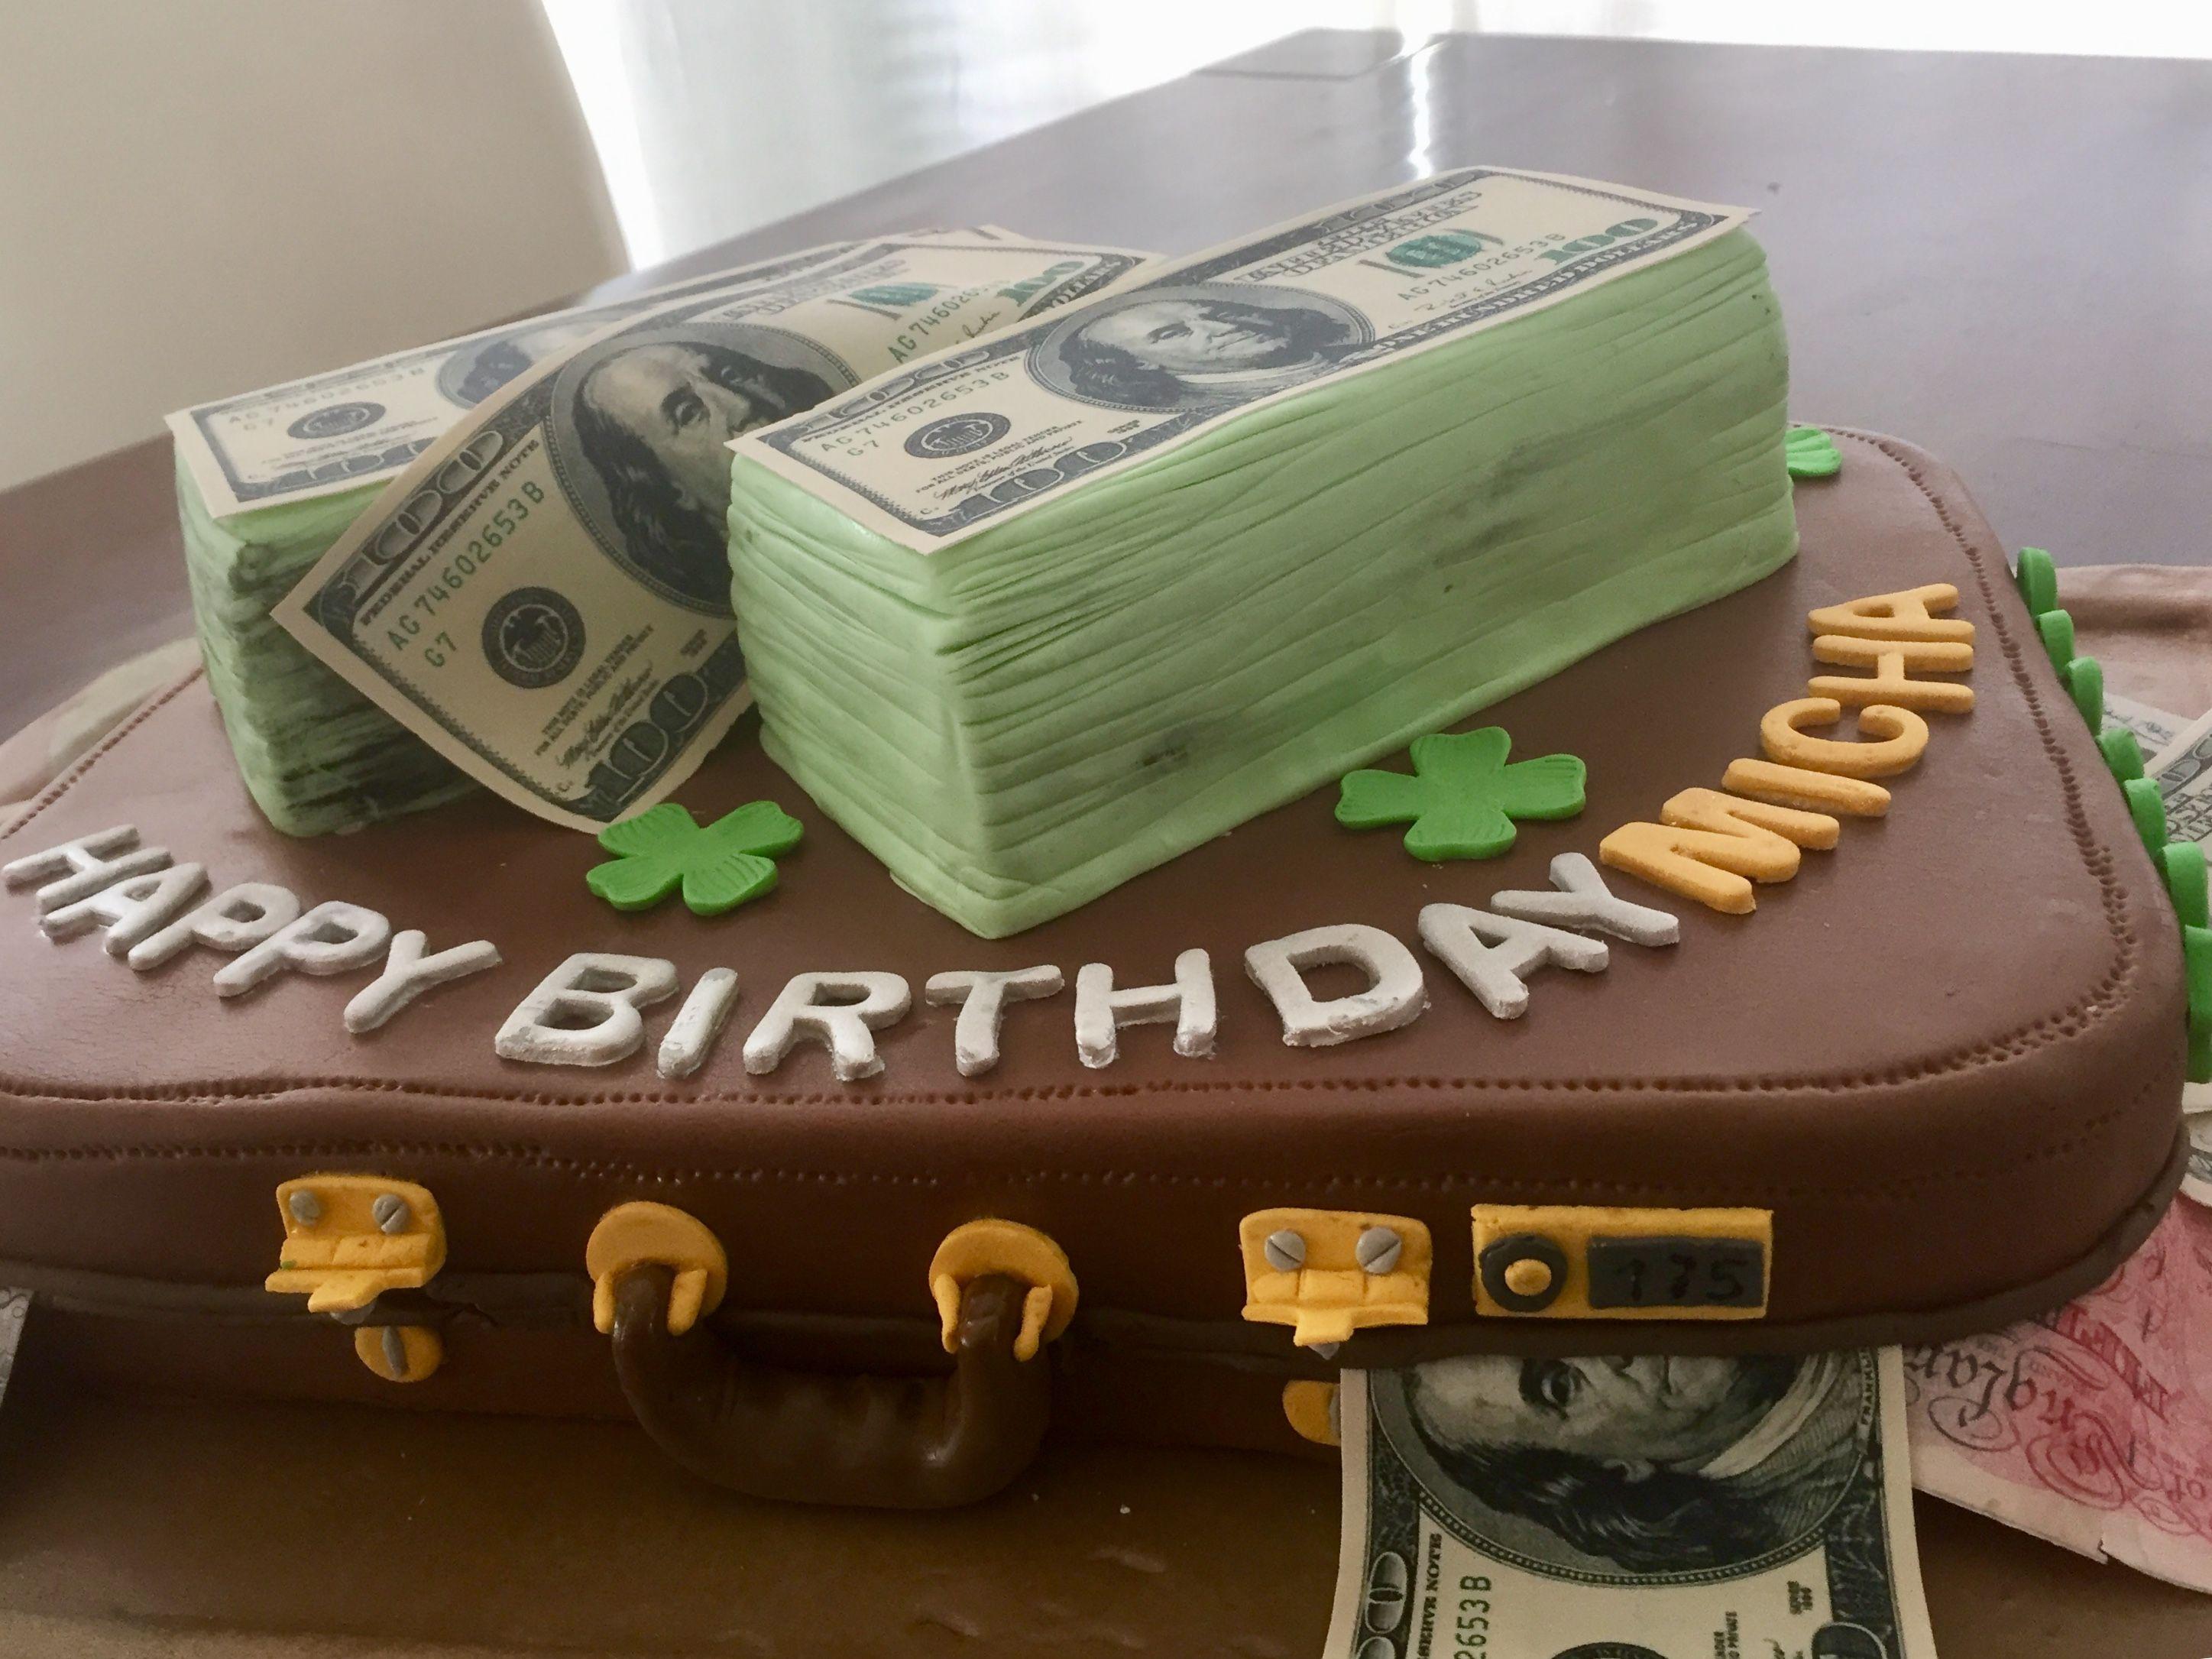 Money Cake Zum Geburtstag Fullung Himbeercreme Und Nougatcreme Himbeercreme Nougatcreme Himbeeren